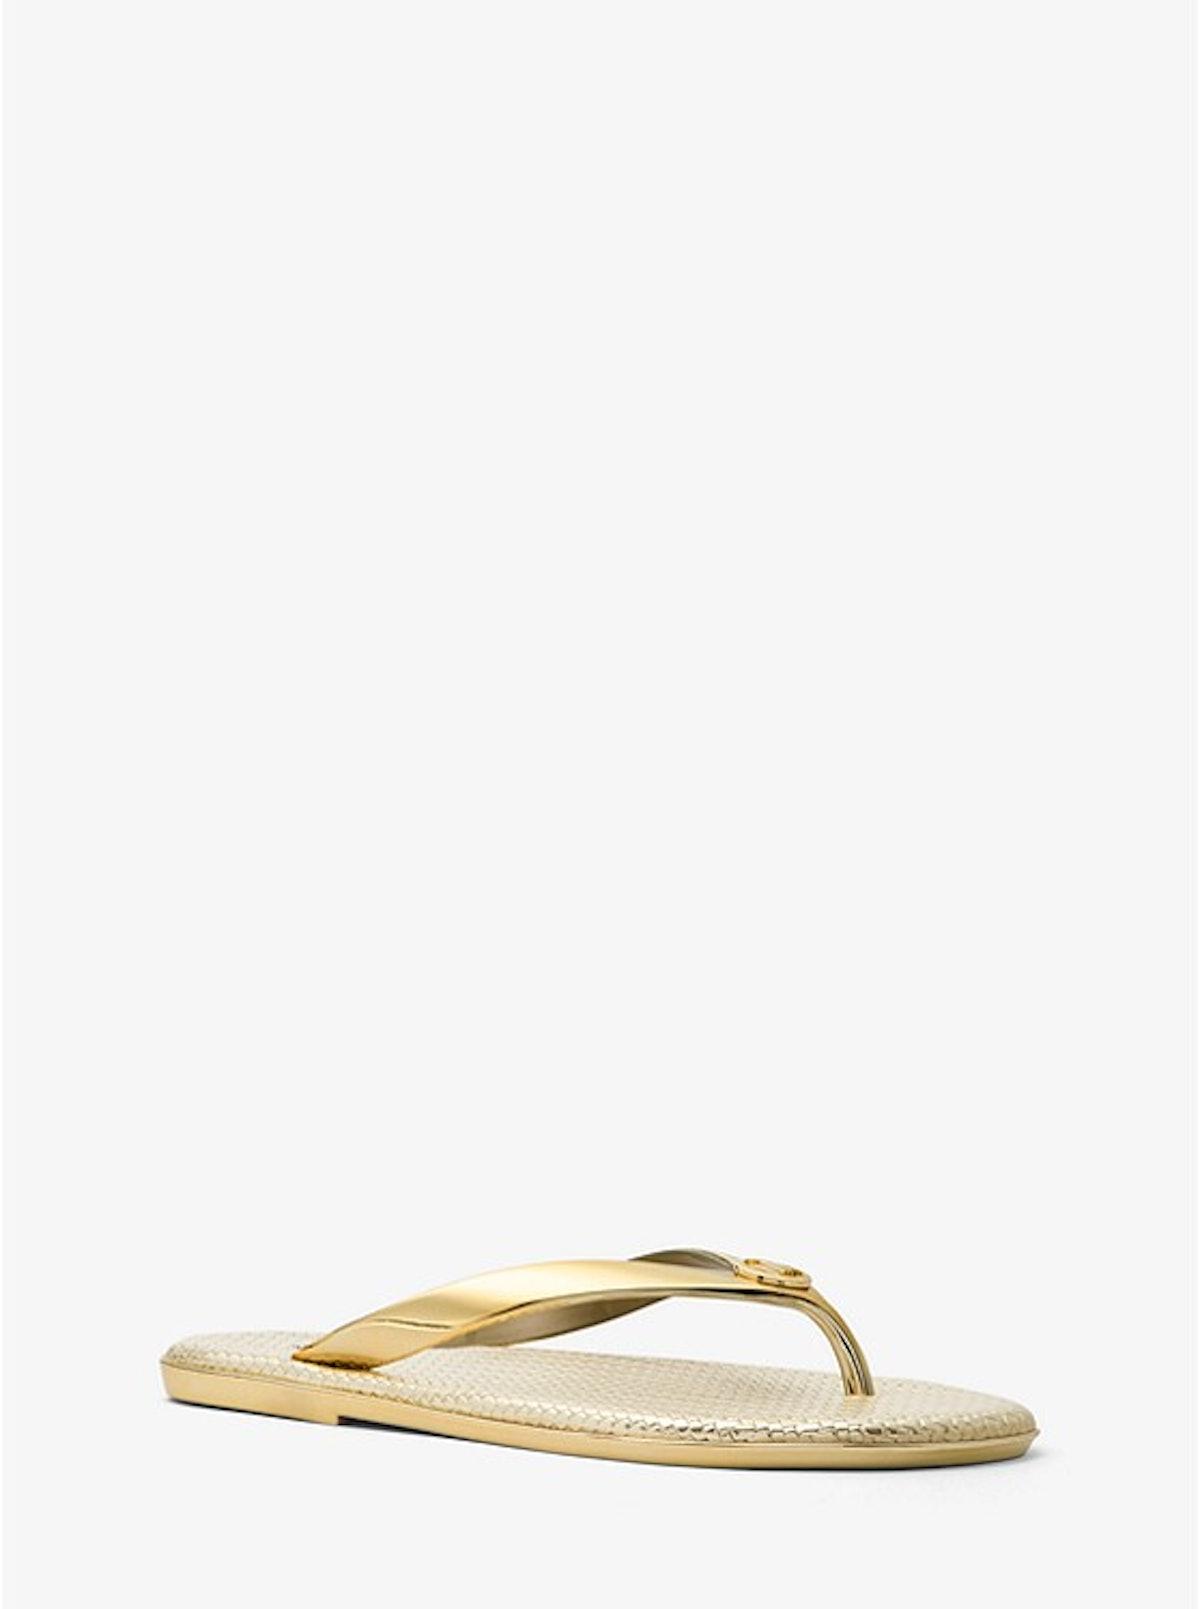 Michael Kors gold flip-flops